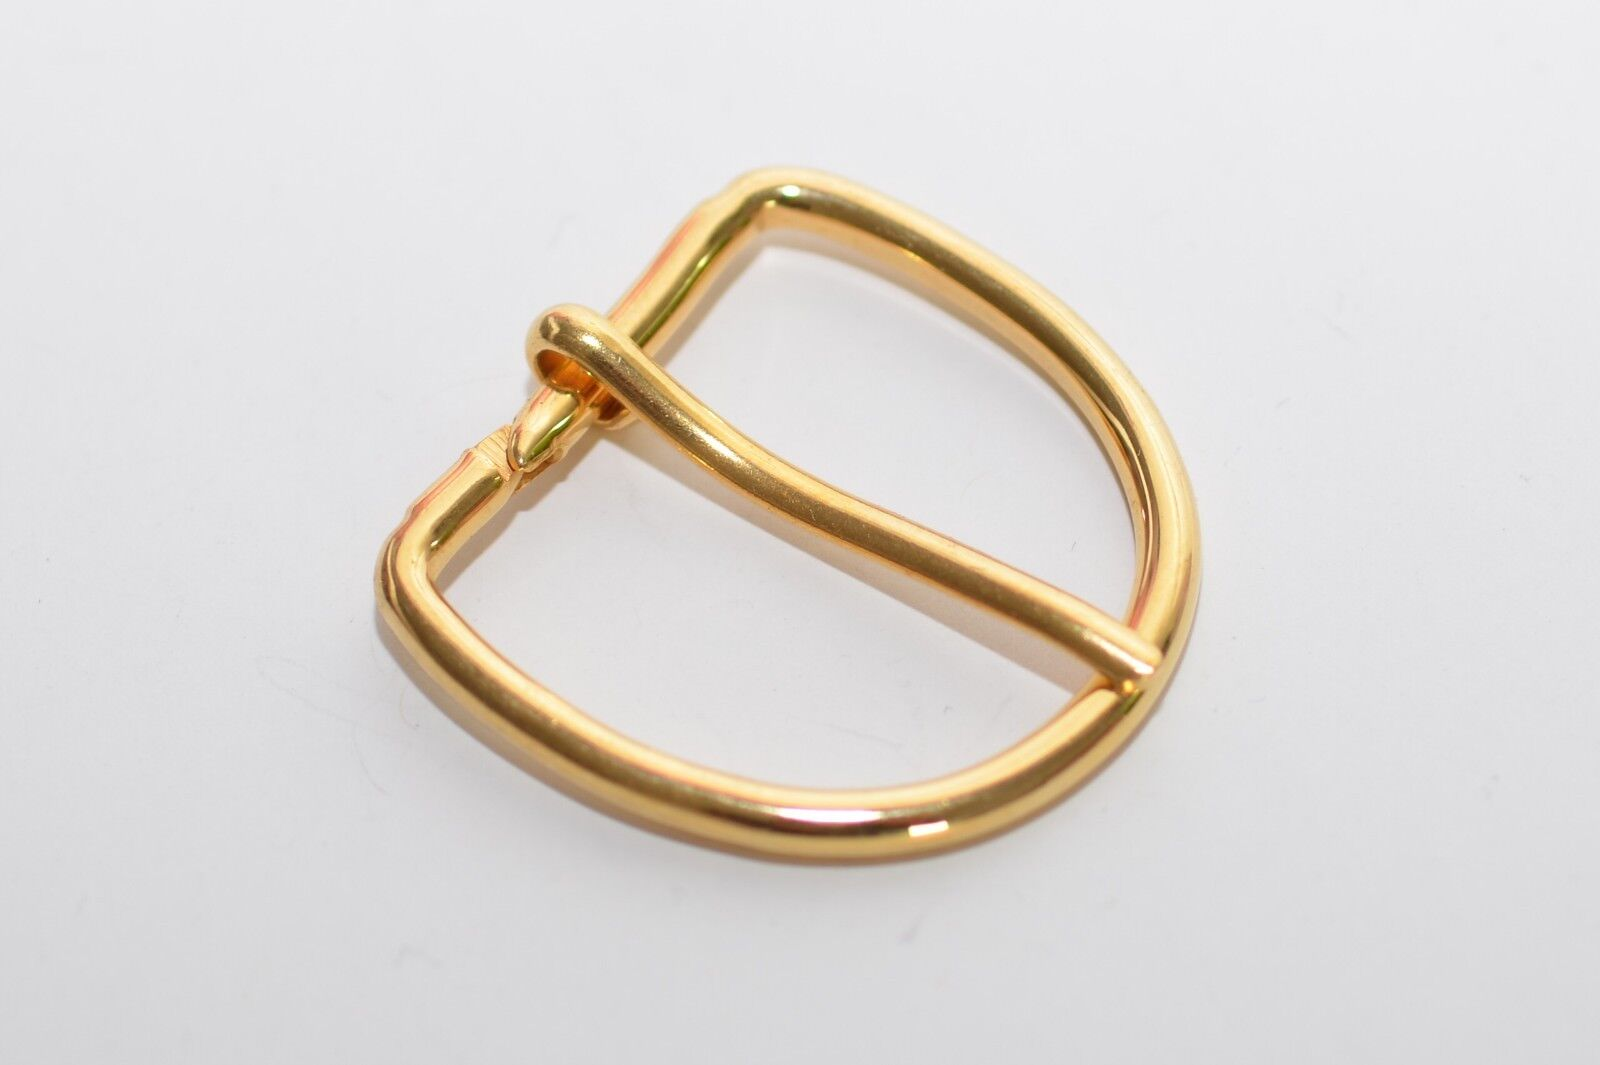 2x Solid Belt Buckle, Approx. 30 MM Width, Gold, Not Welded